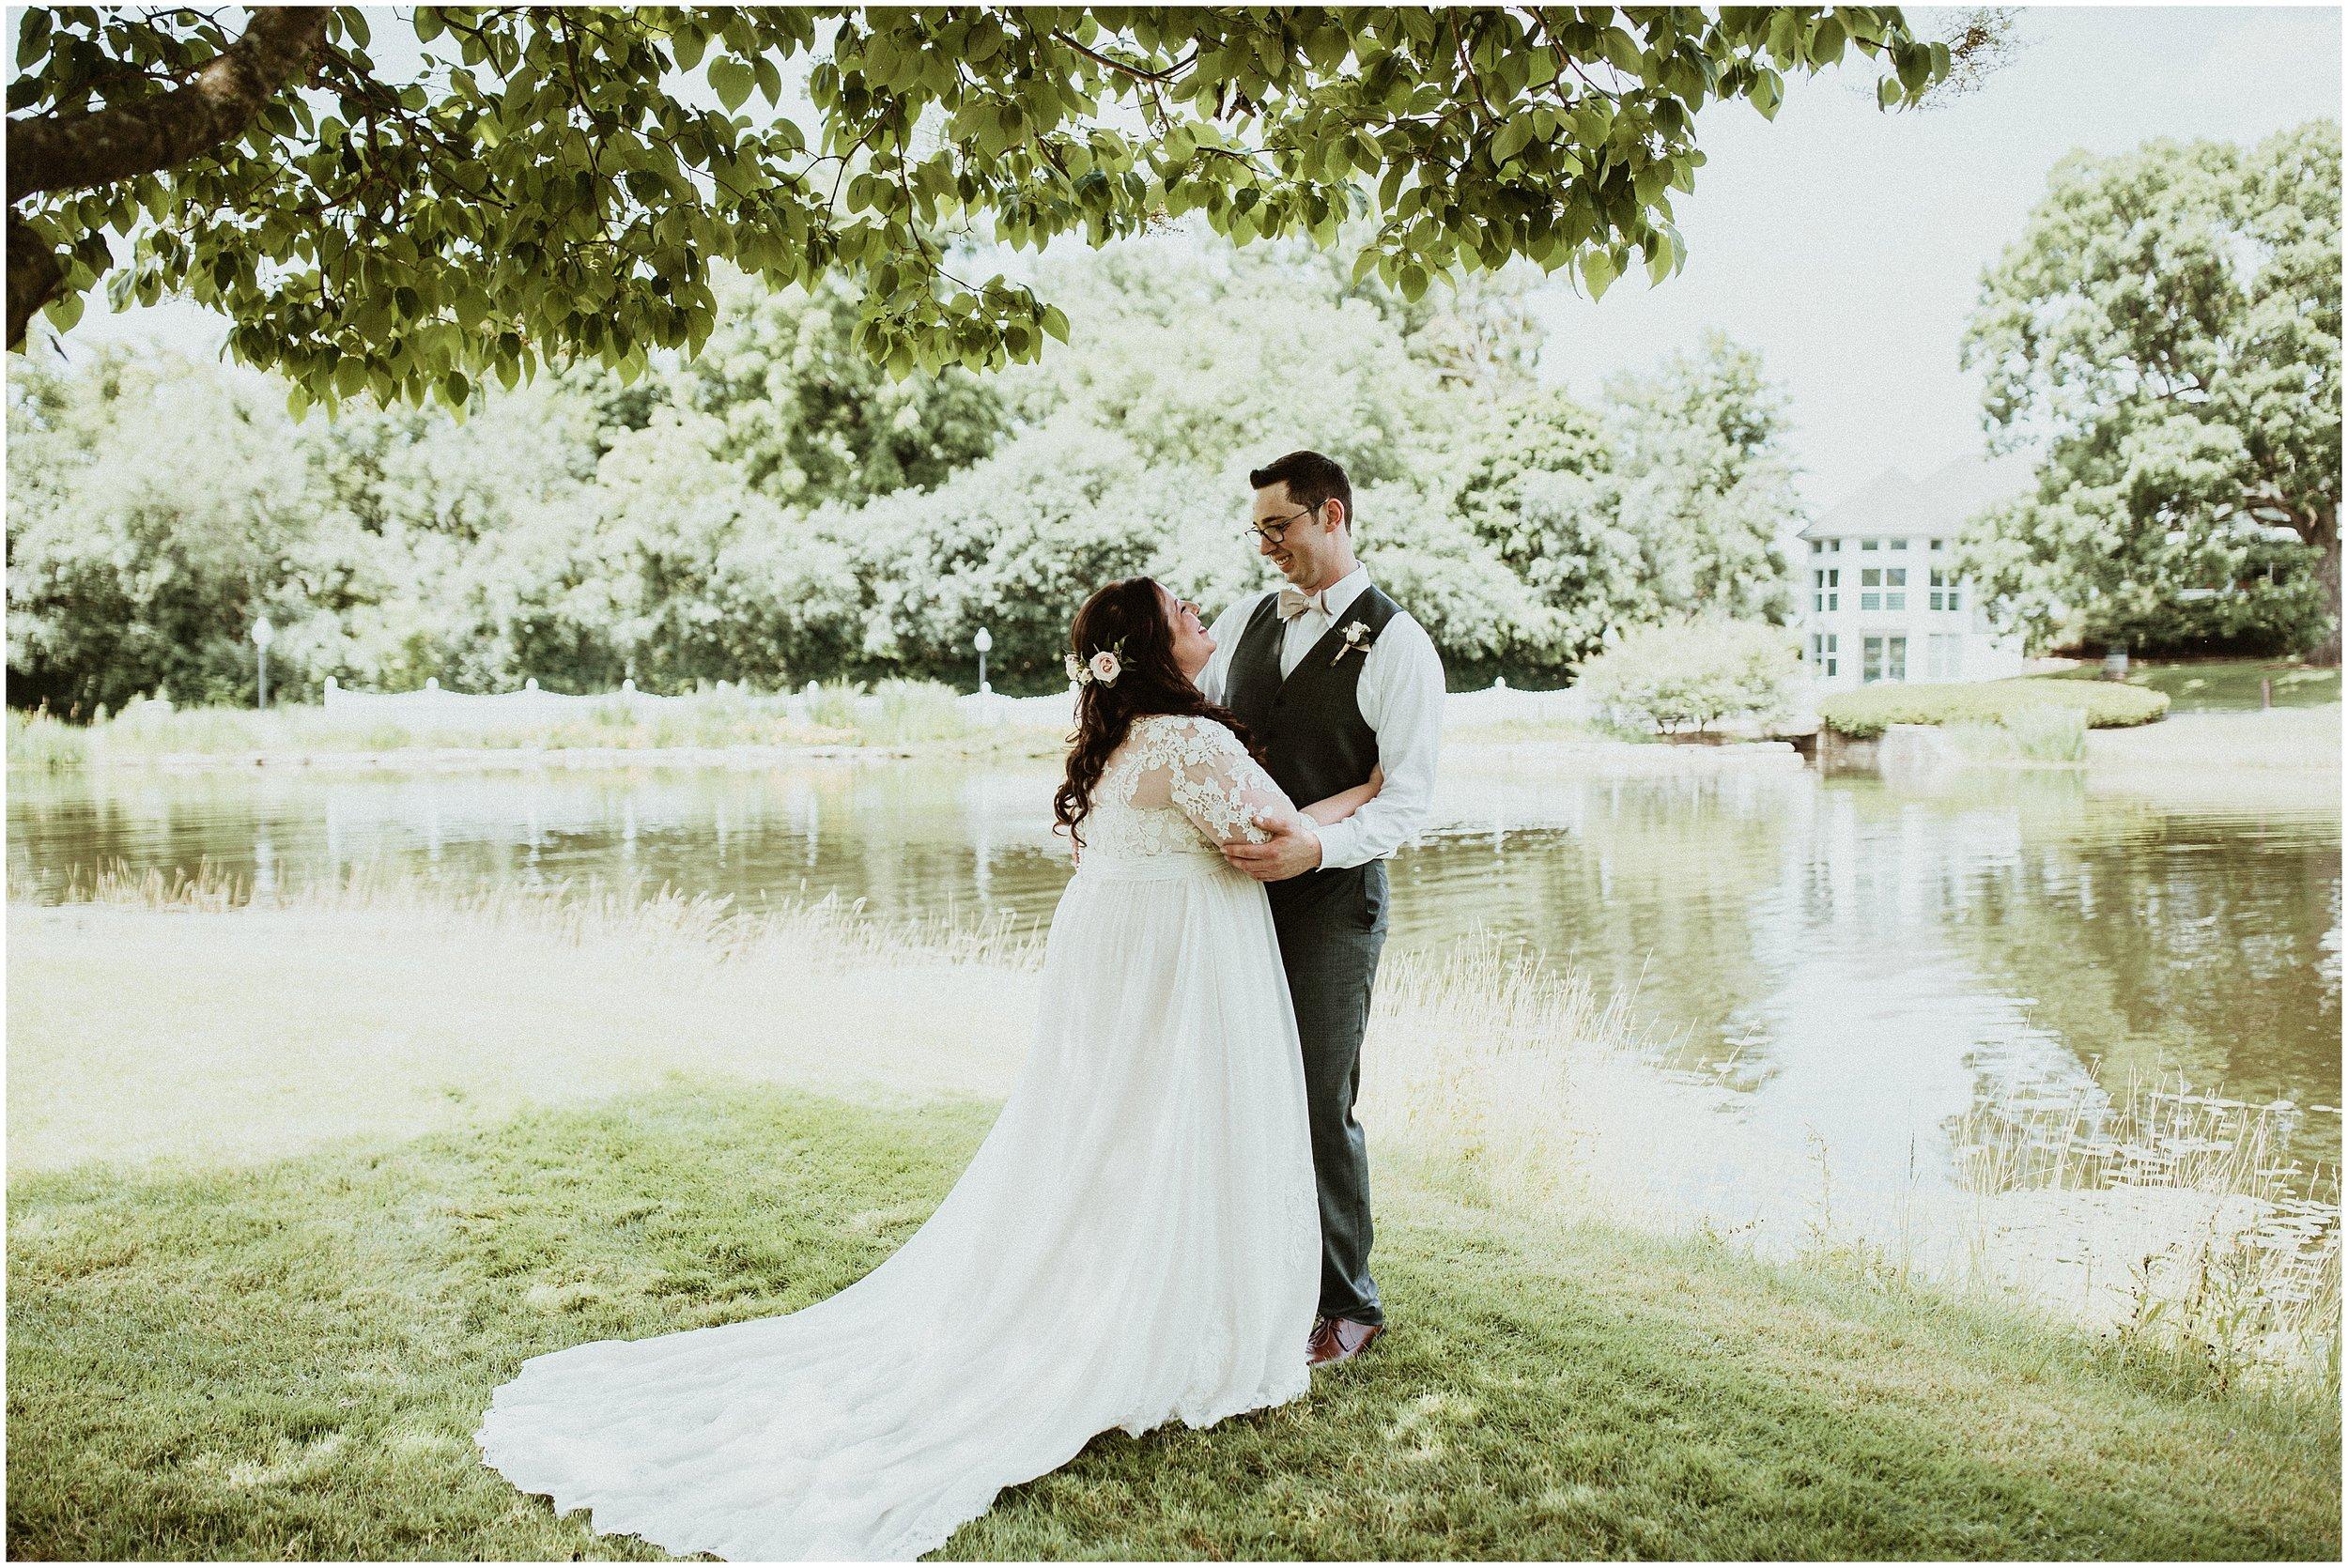 Rachel And Patrick | Rustic & Romantic | Disney Themed Summer Wedding | Q Center St. Charles, IL